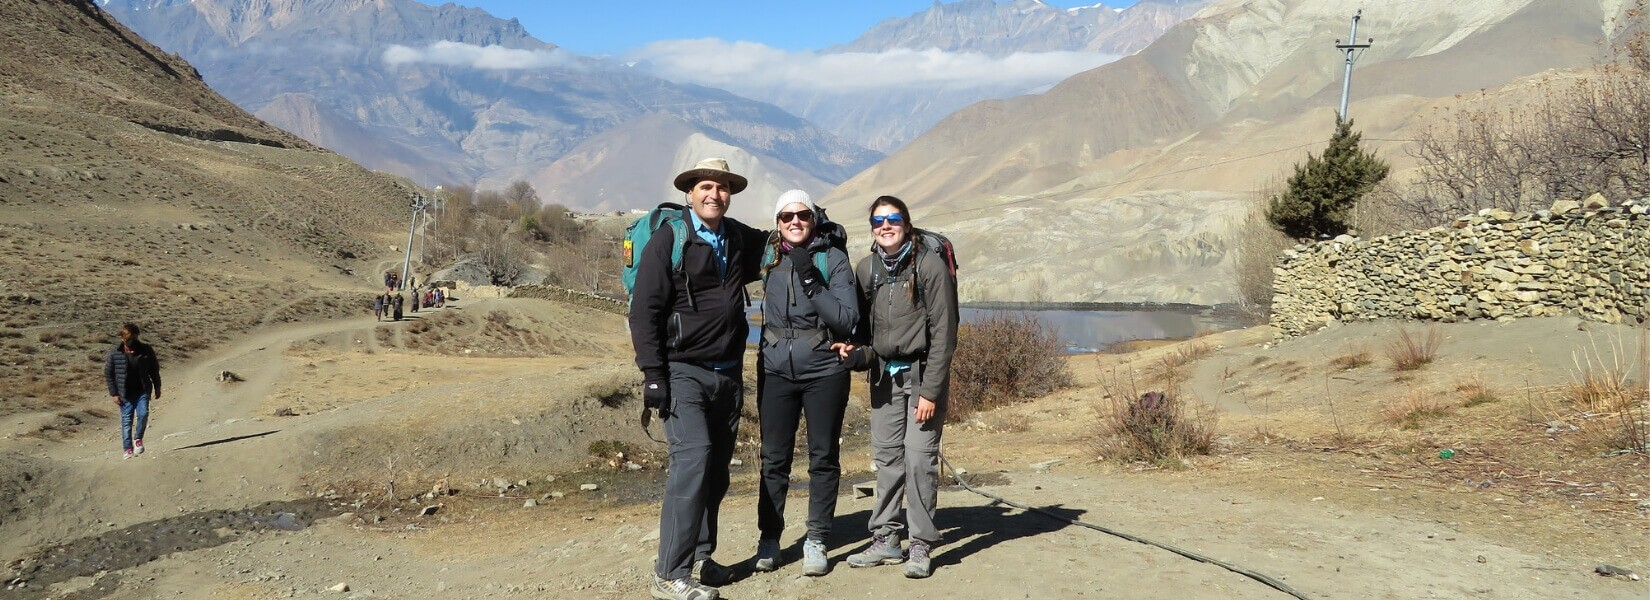 Annapurna Circuit Trek details